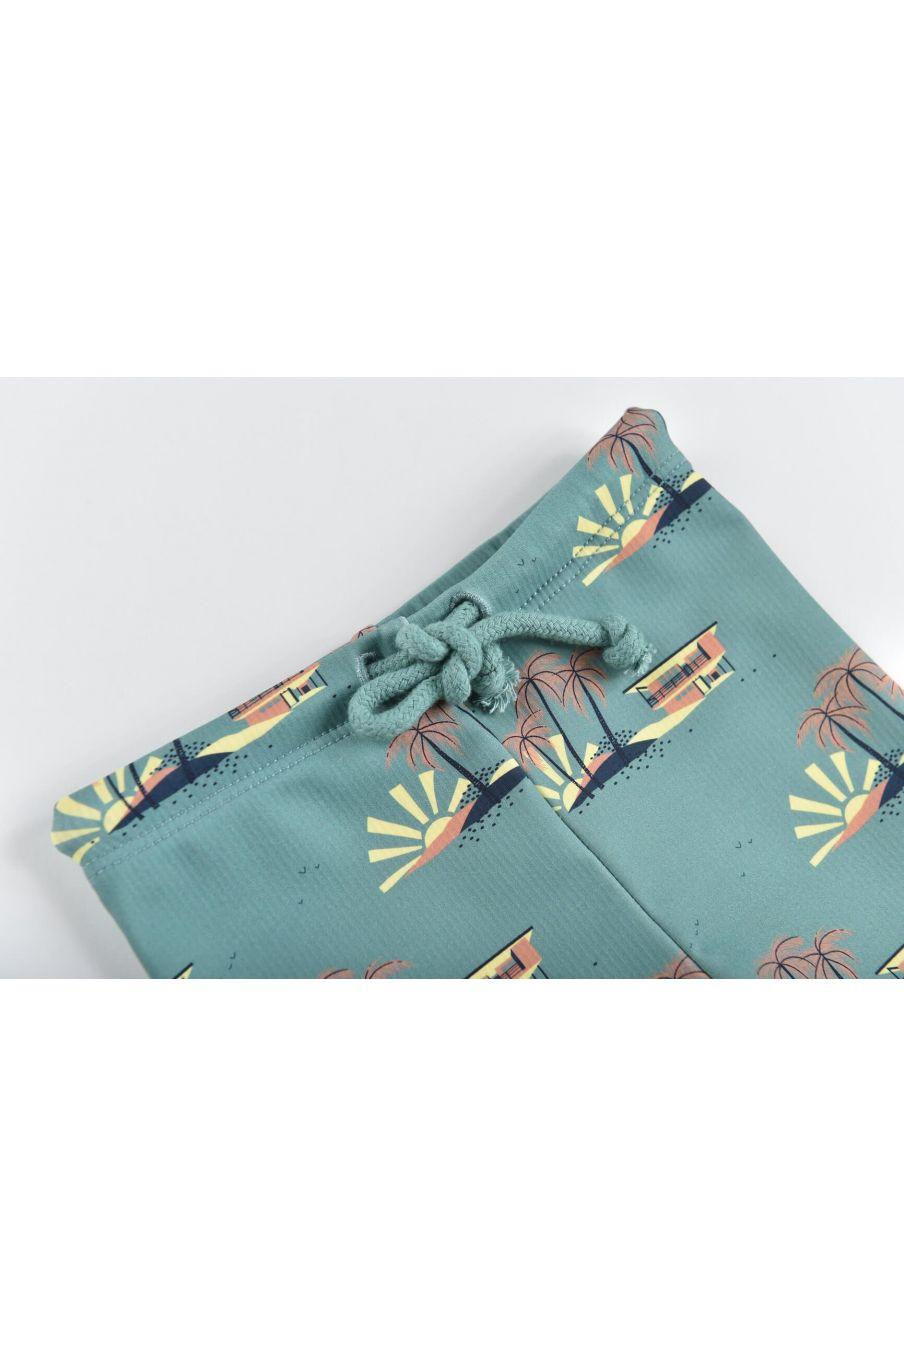 boheme chic vintage set de protection uv garcon agik vintage blue hawaï